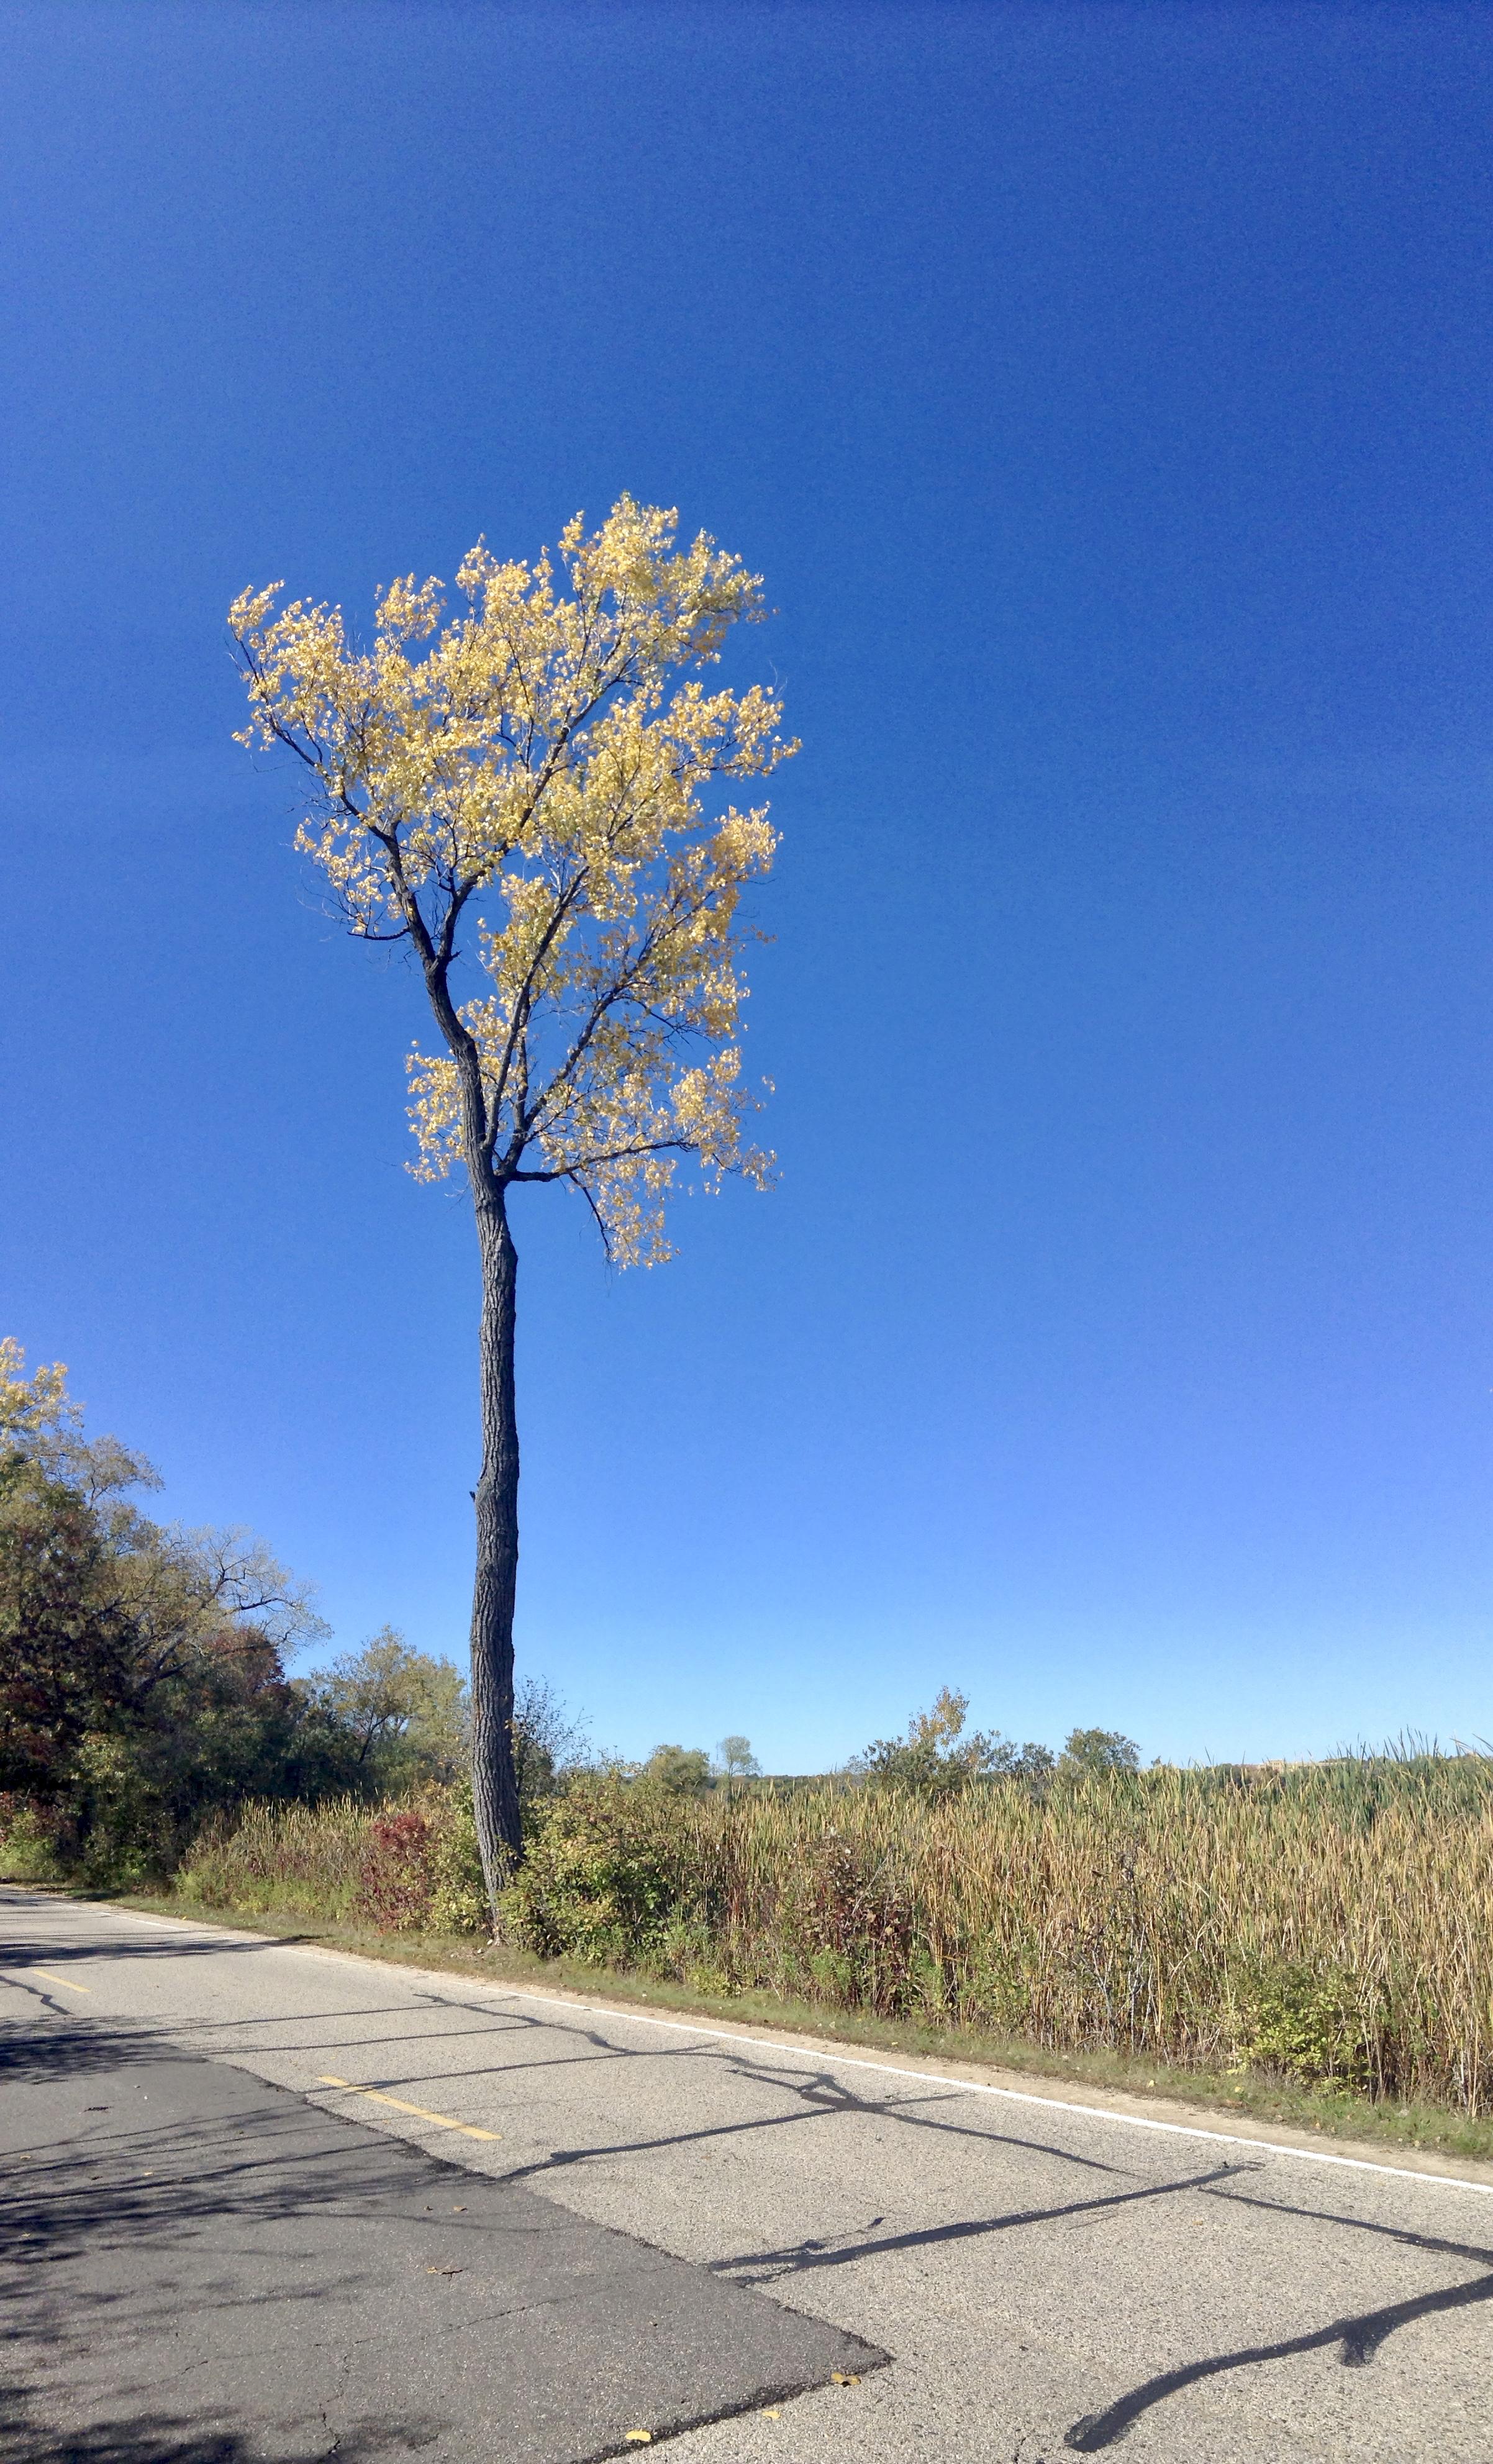 Trunk. UW Arboretum. Madison, Wisconsin. October 2013. © William D. Walker